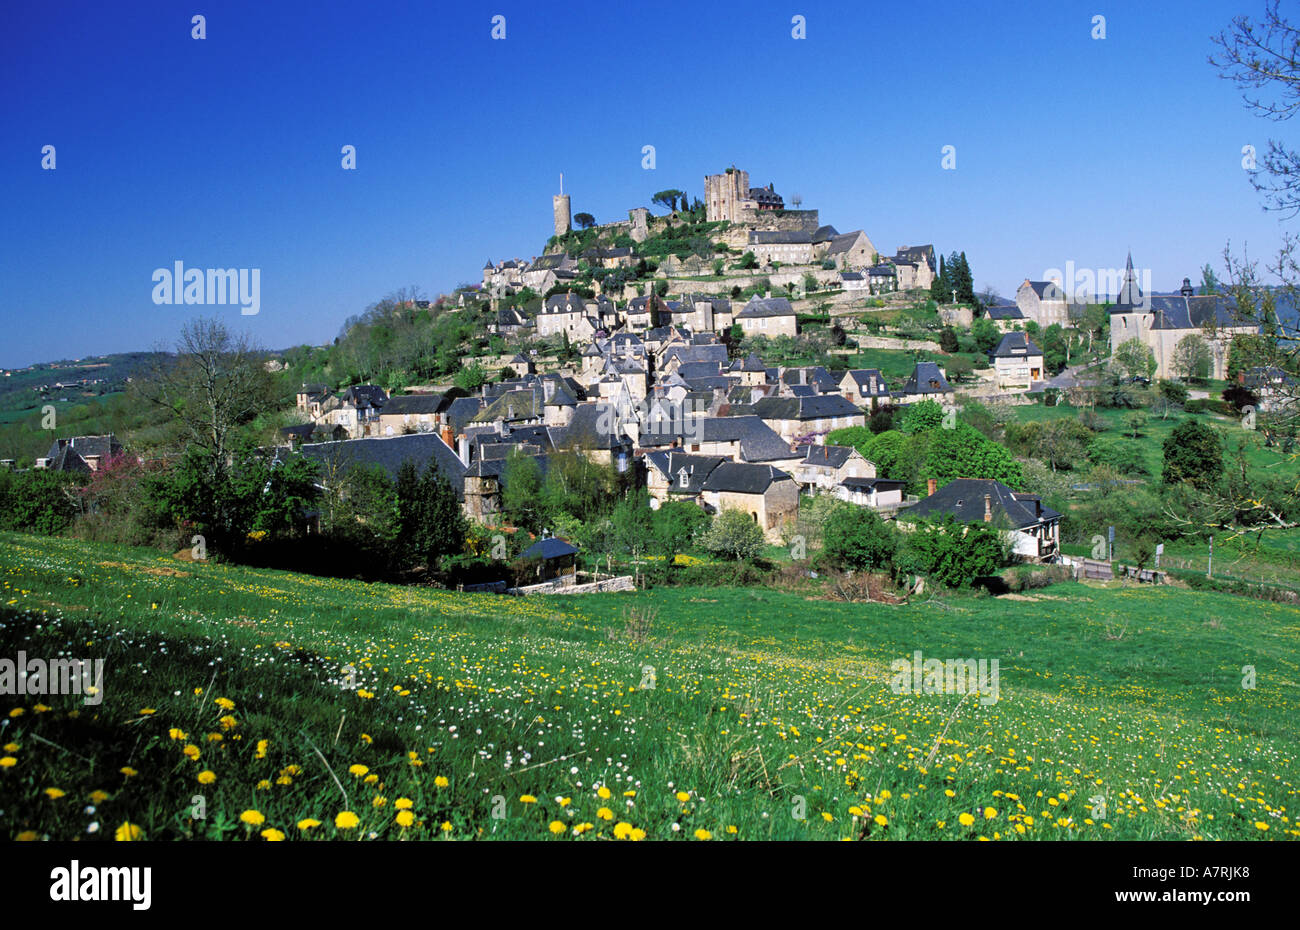 France, Correze, Turenne village - Stock Image